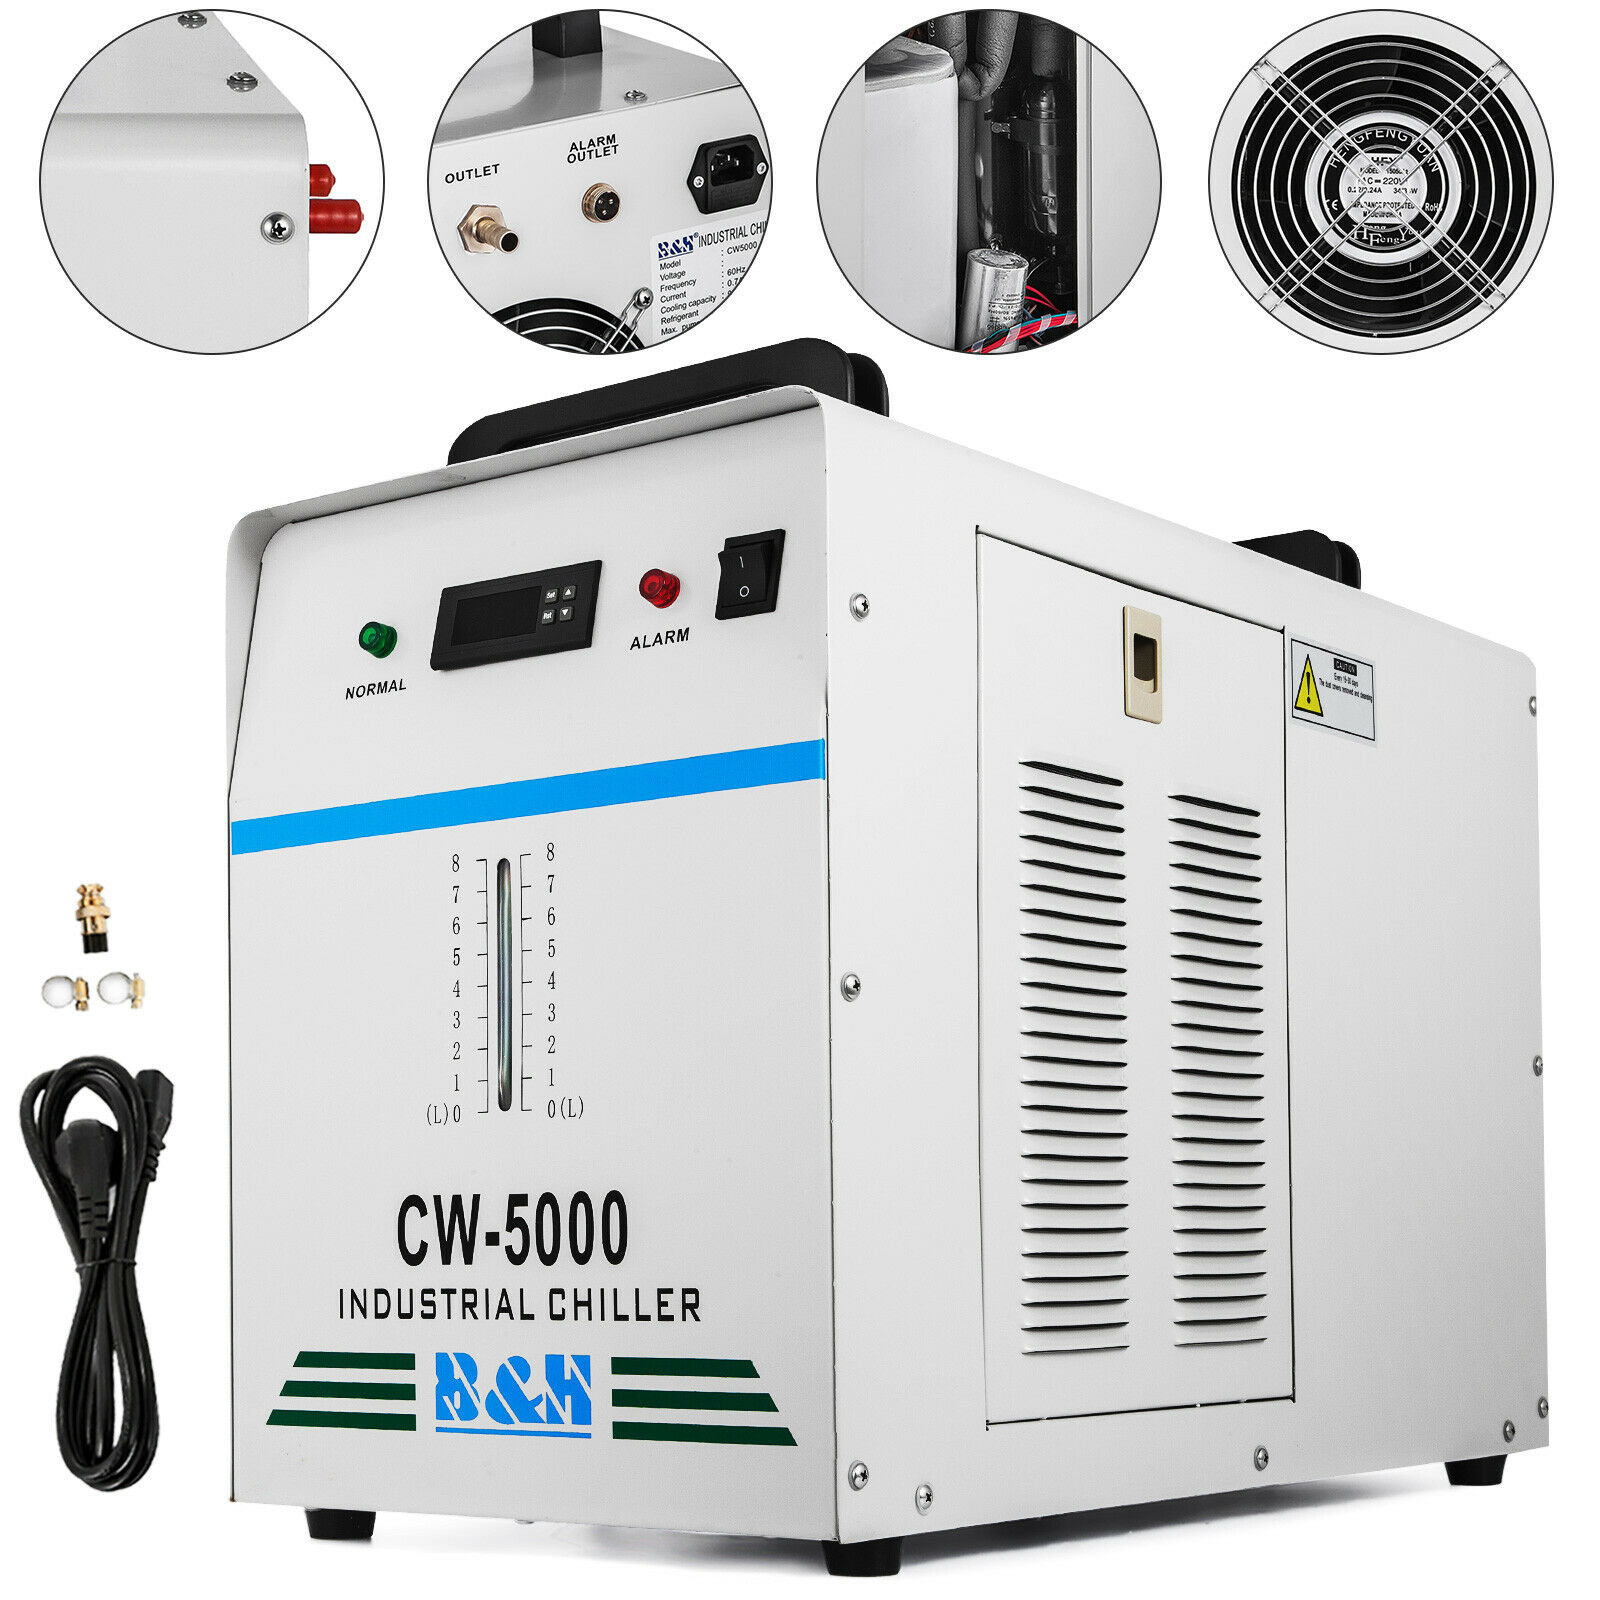 CW-5000DG INDUSTRIAL WATER CHILLER 6L TANK LASER EQUIPMENT CO2 GLASS LASER